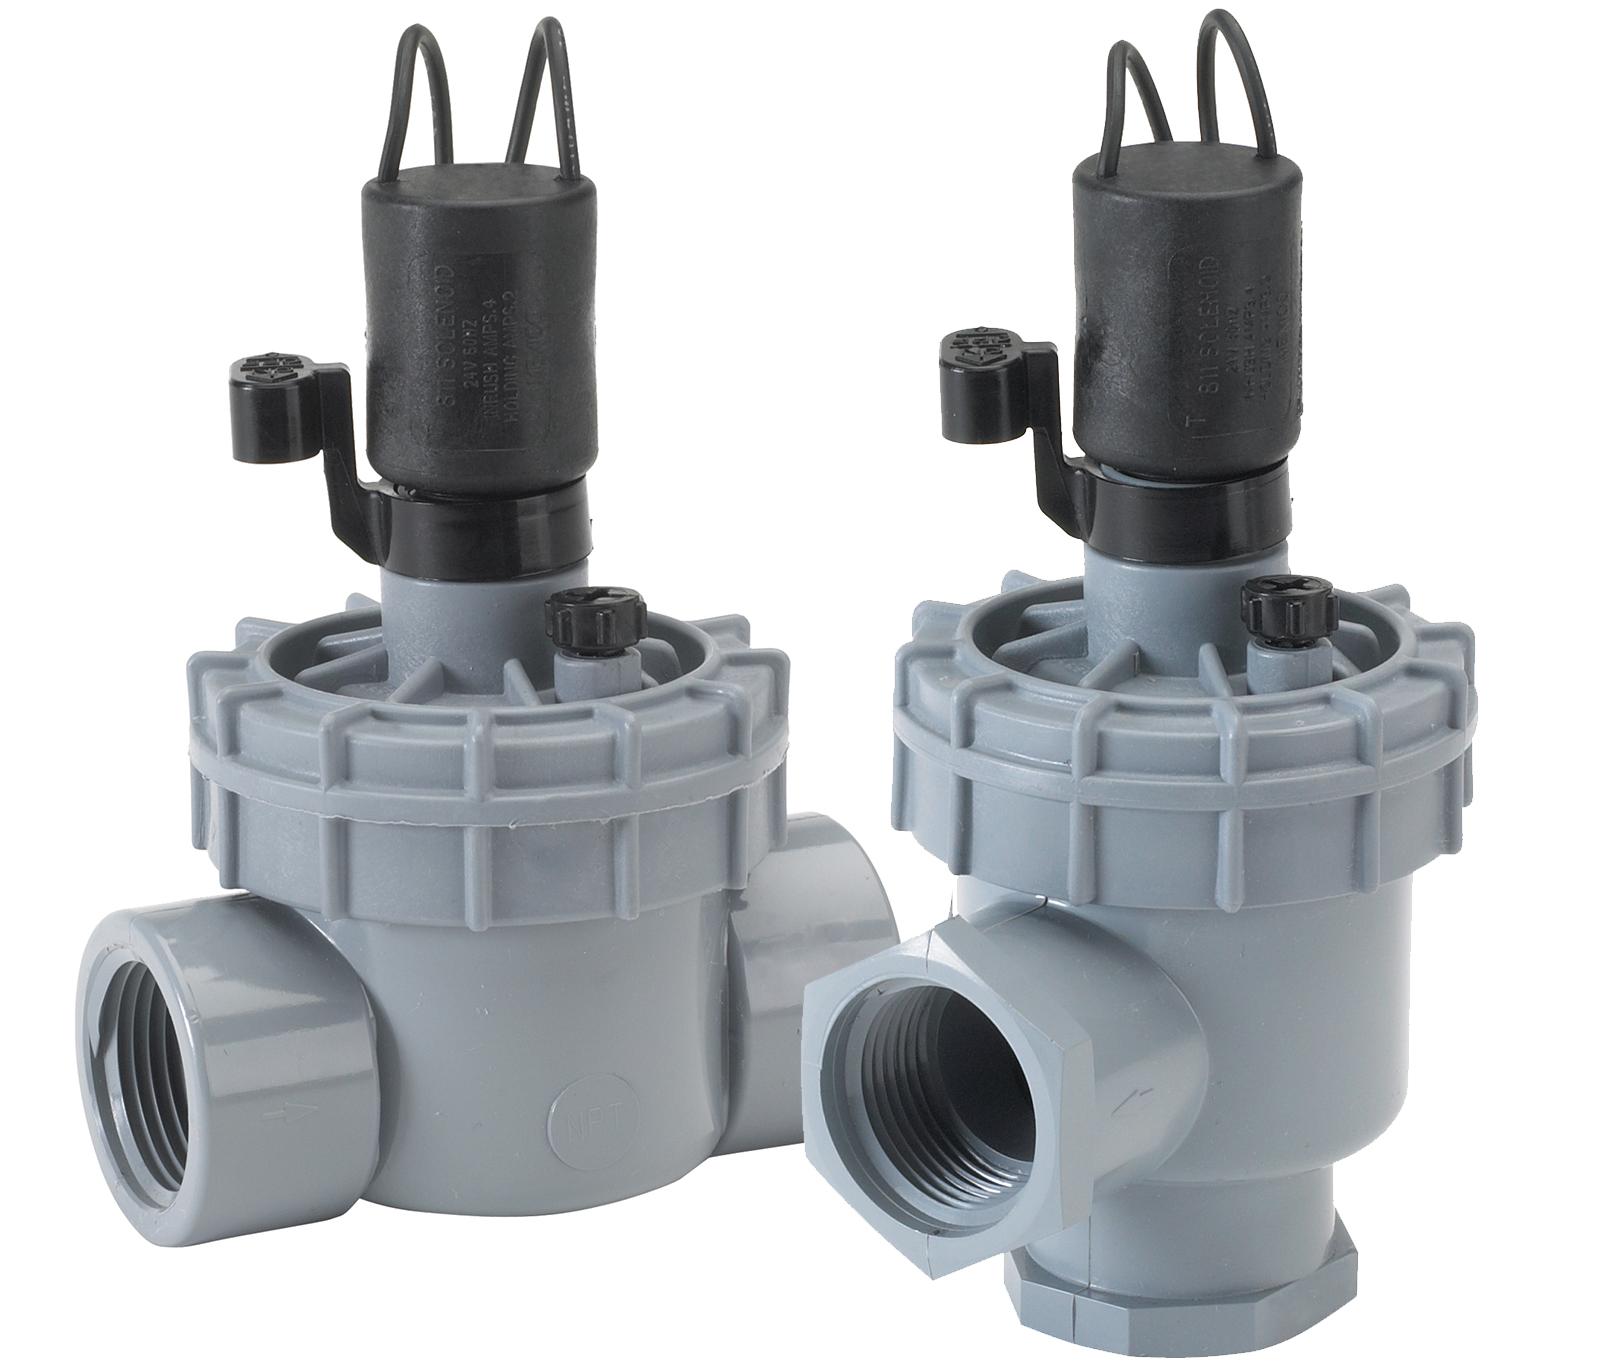 richdel sprinkler valve diagram clam internal anatomy irritrol valves 2400 2600 series